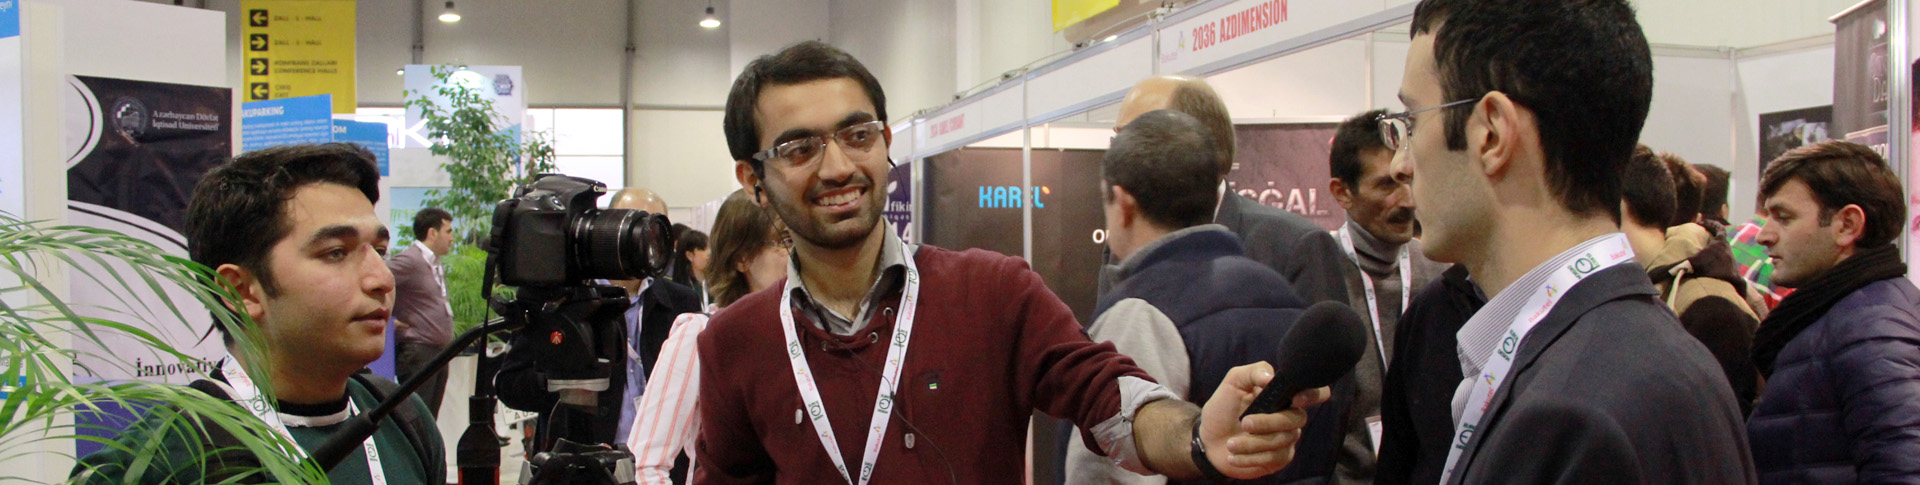 ACM representative gives interview at BakuTel 2014